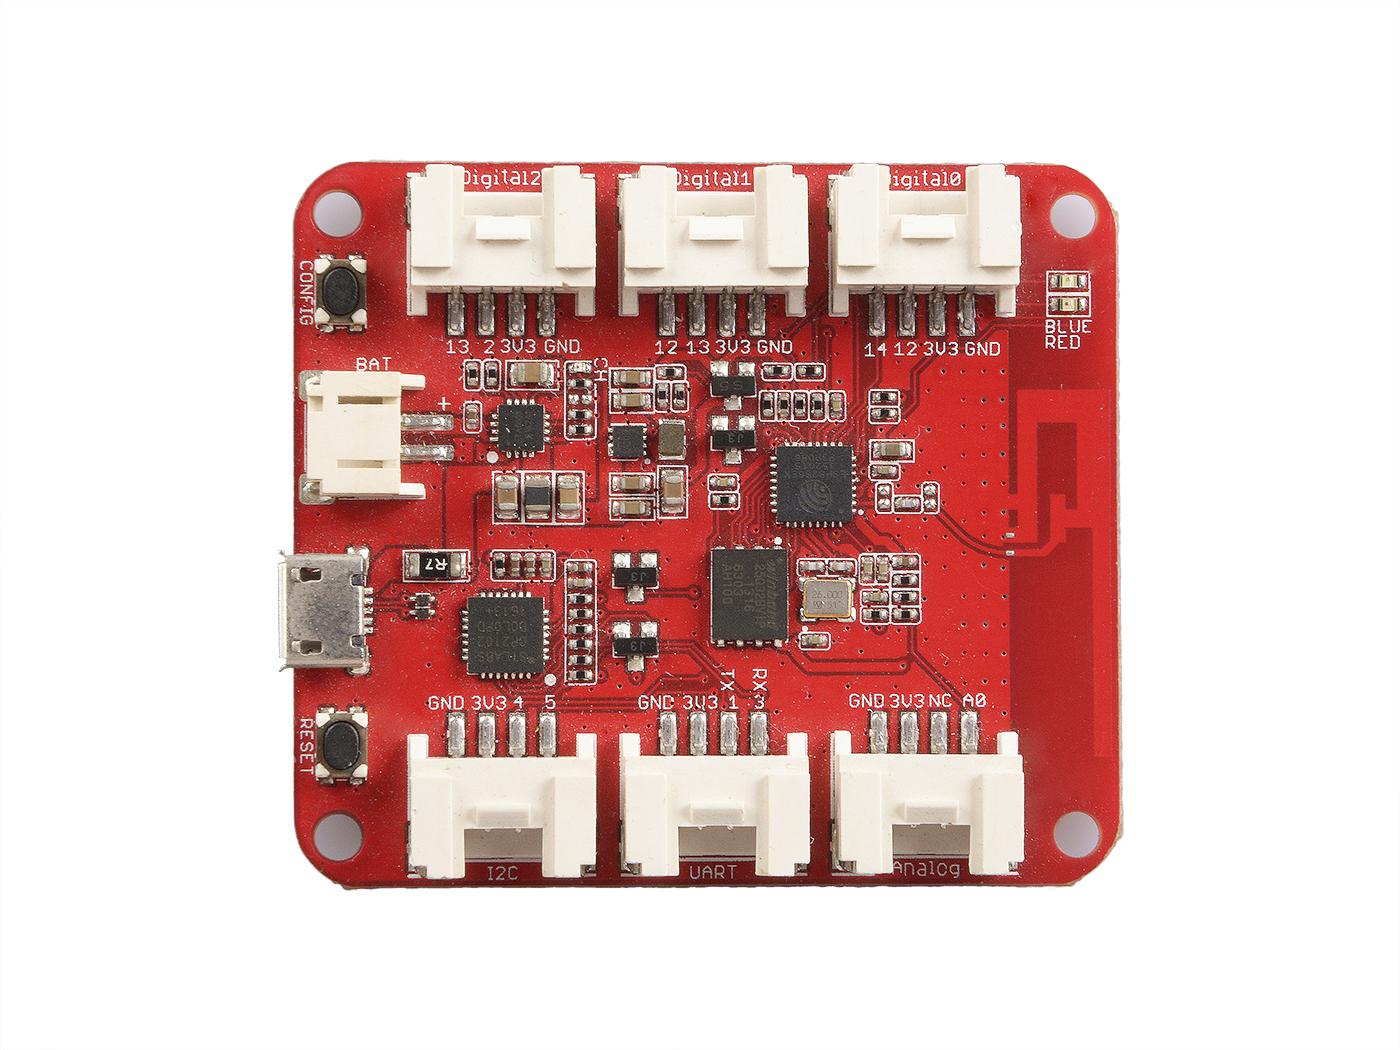 Wio Link Iot Seeed Studio Battery Eliminator Circuit Board Perspex Mounting Plate Us